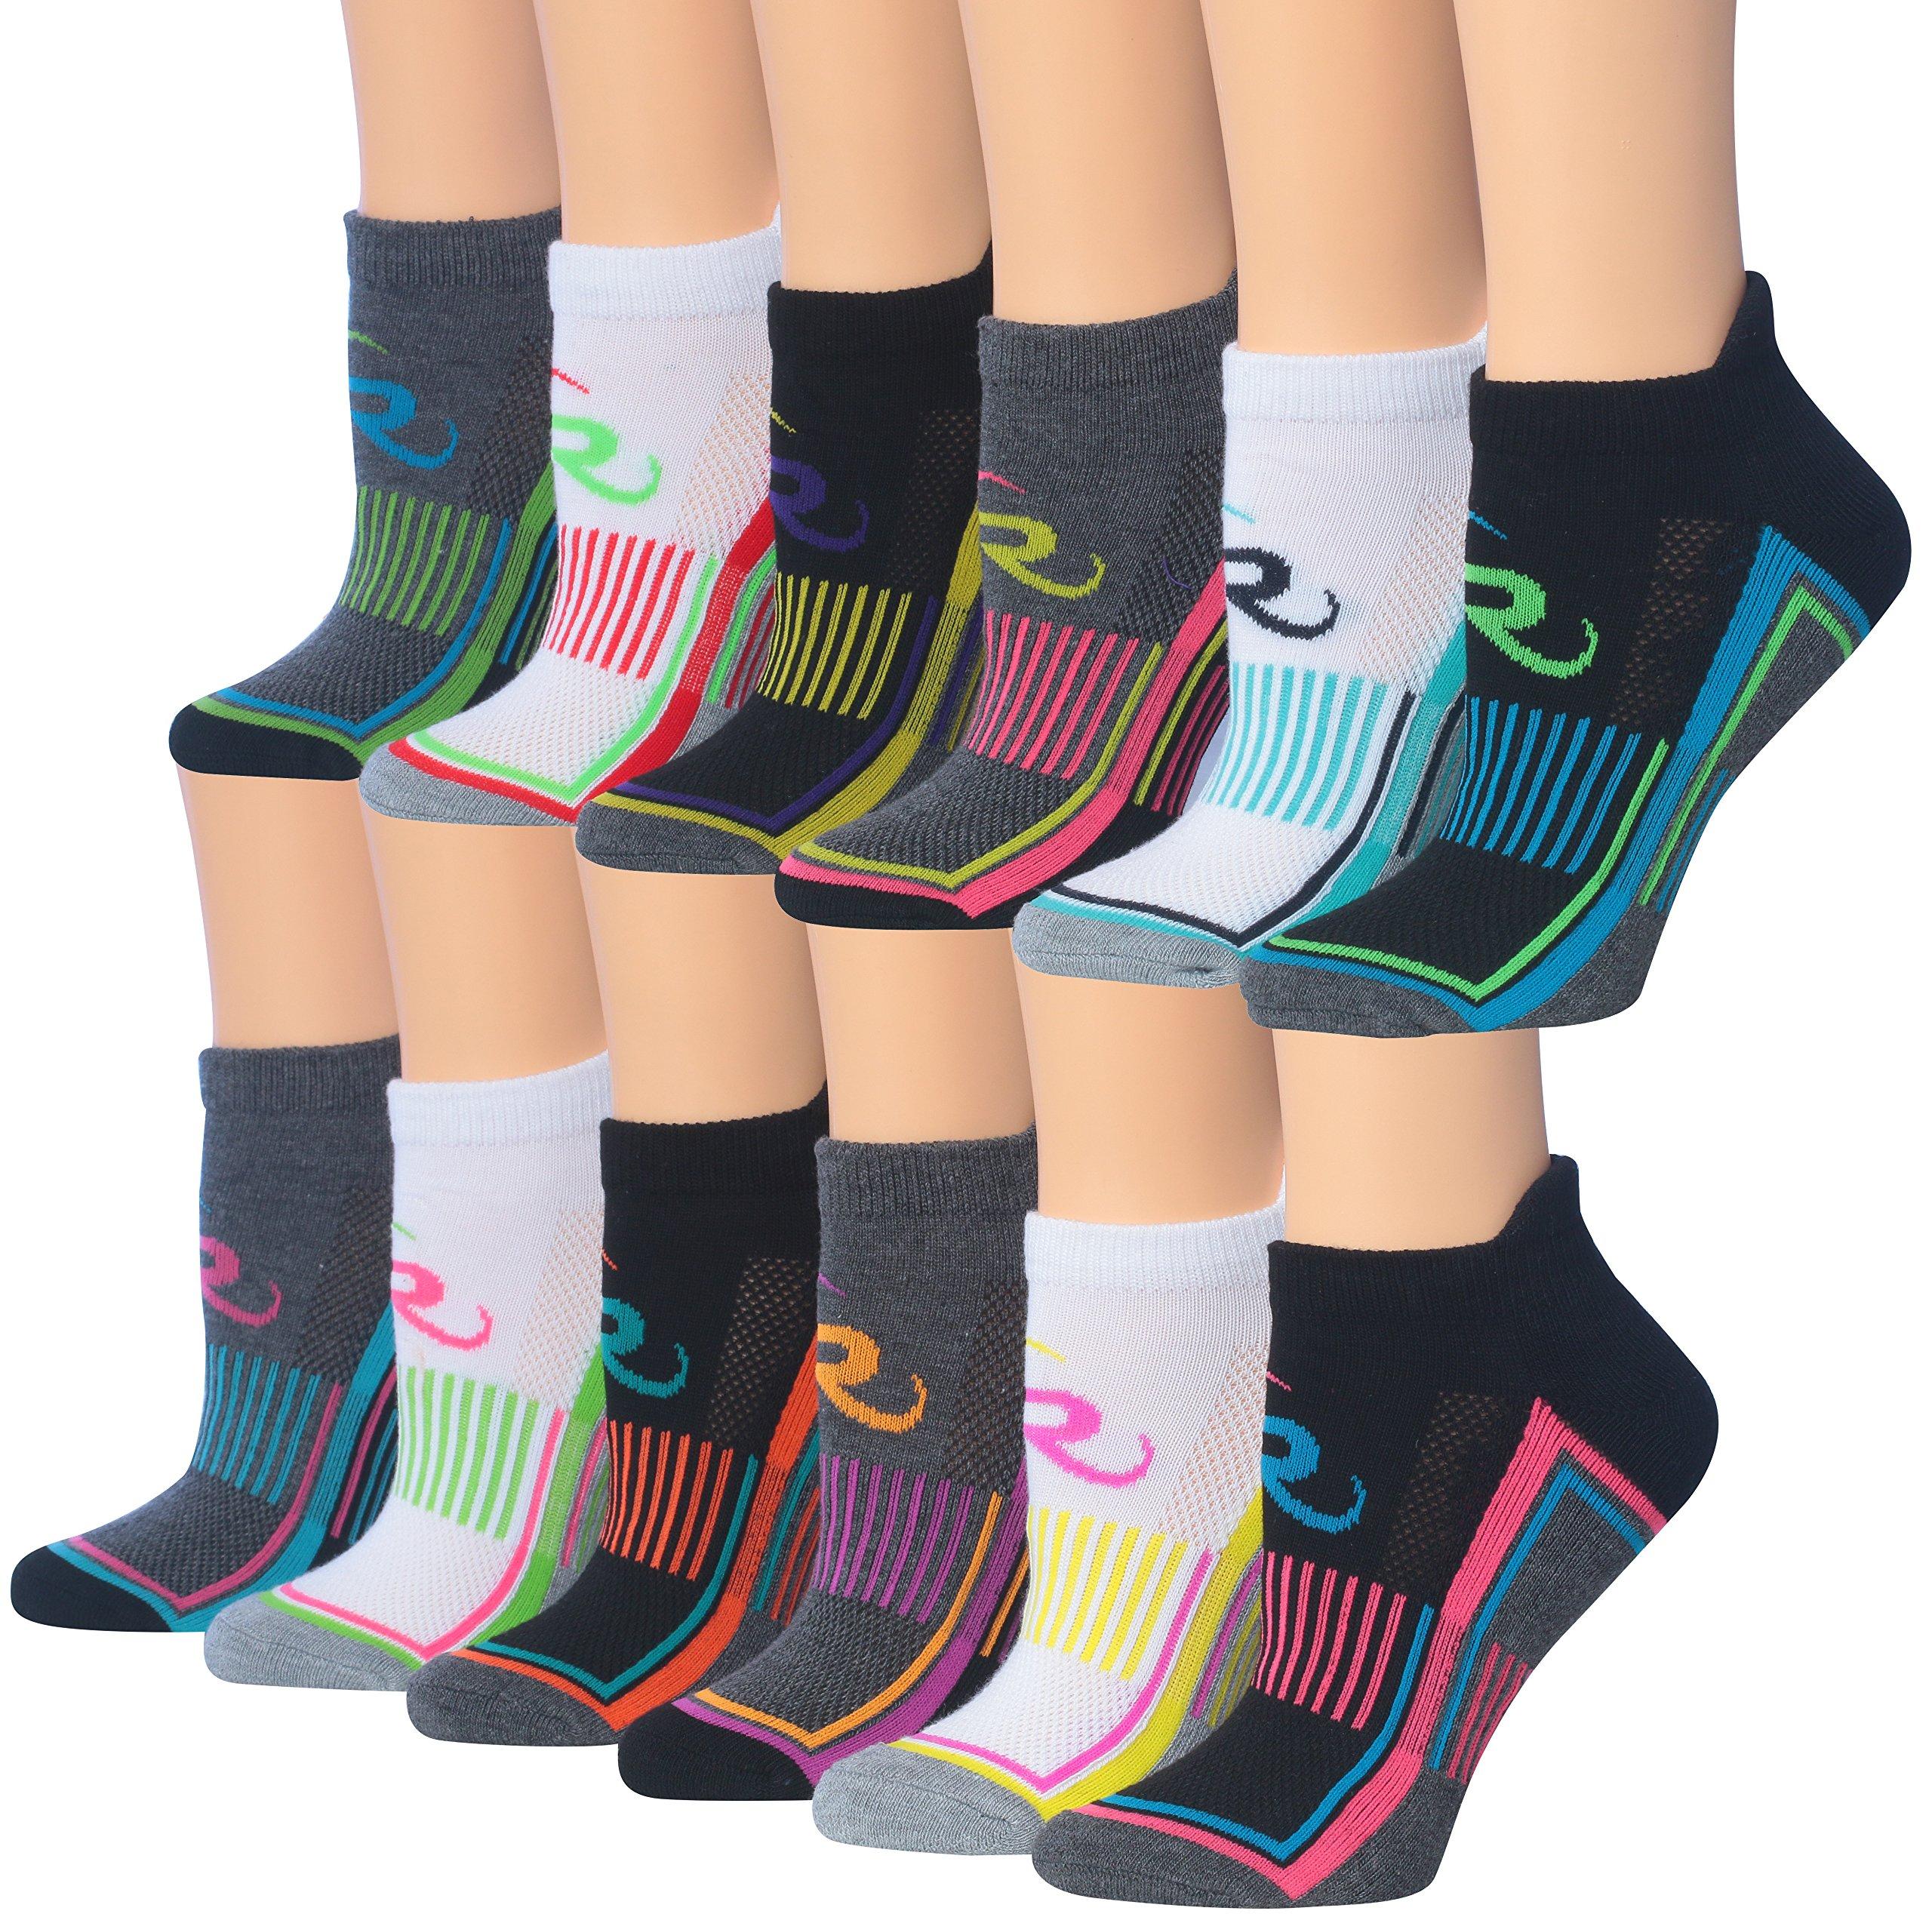 Ronnox Women's 12-Pairs Low Cut Running & Athletic Performance Socks Medium/Large RLT11-AB by RONNOX